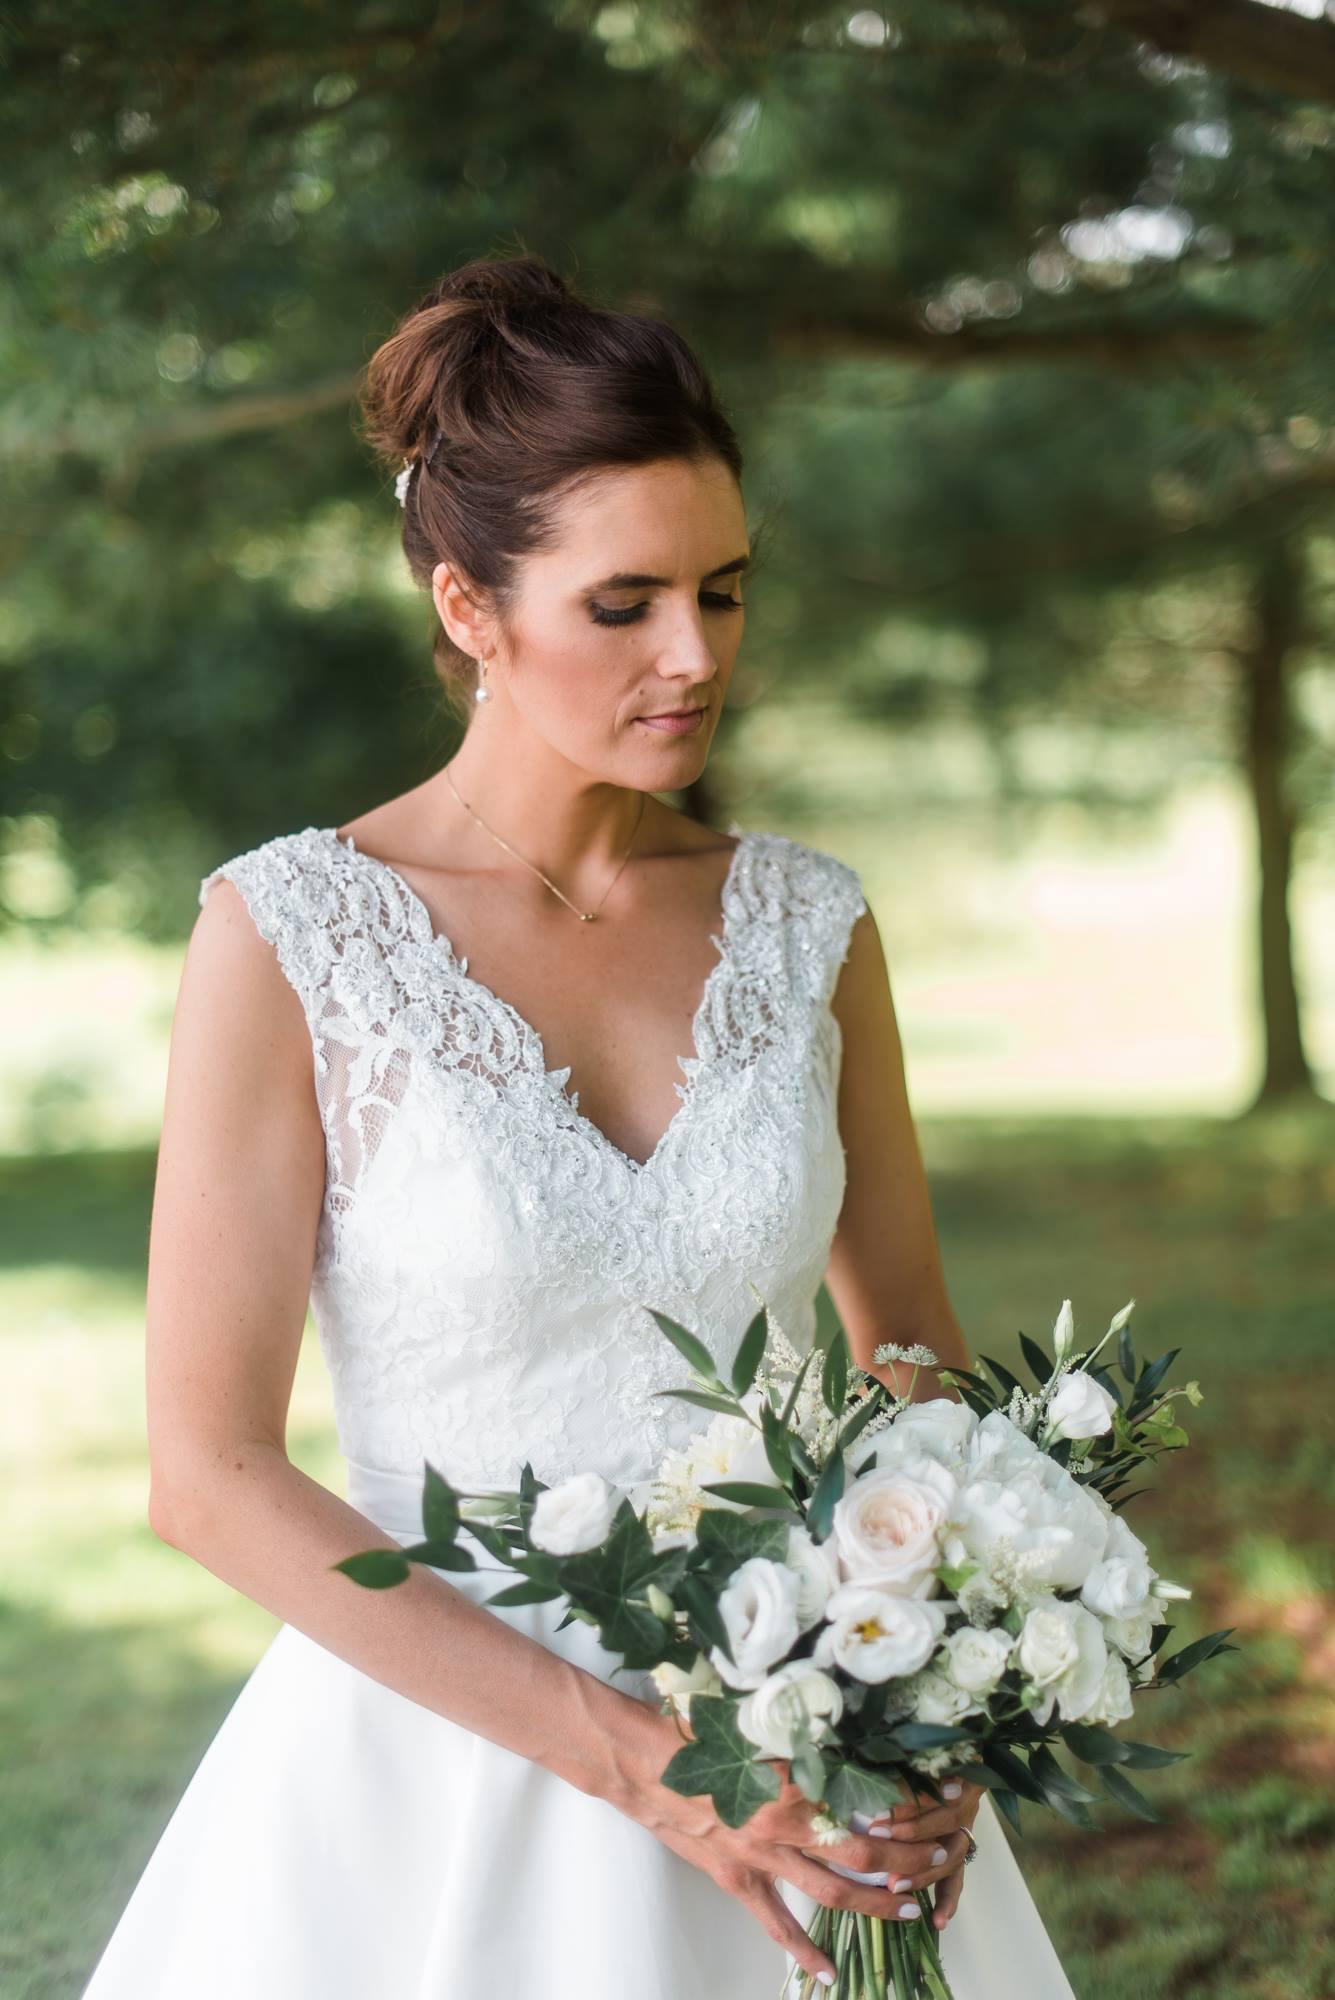 pittsburgh-pennsylvania-backyard-glam-chic-modern-classic-wedding-0014.jpg